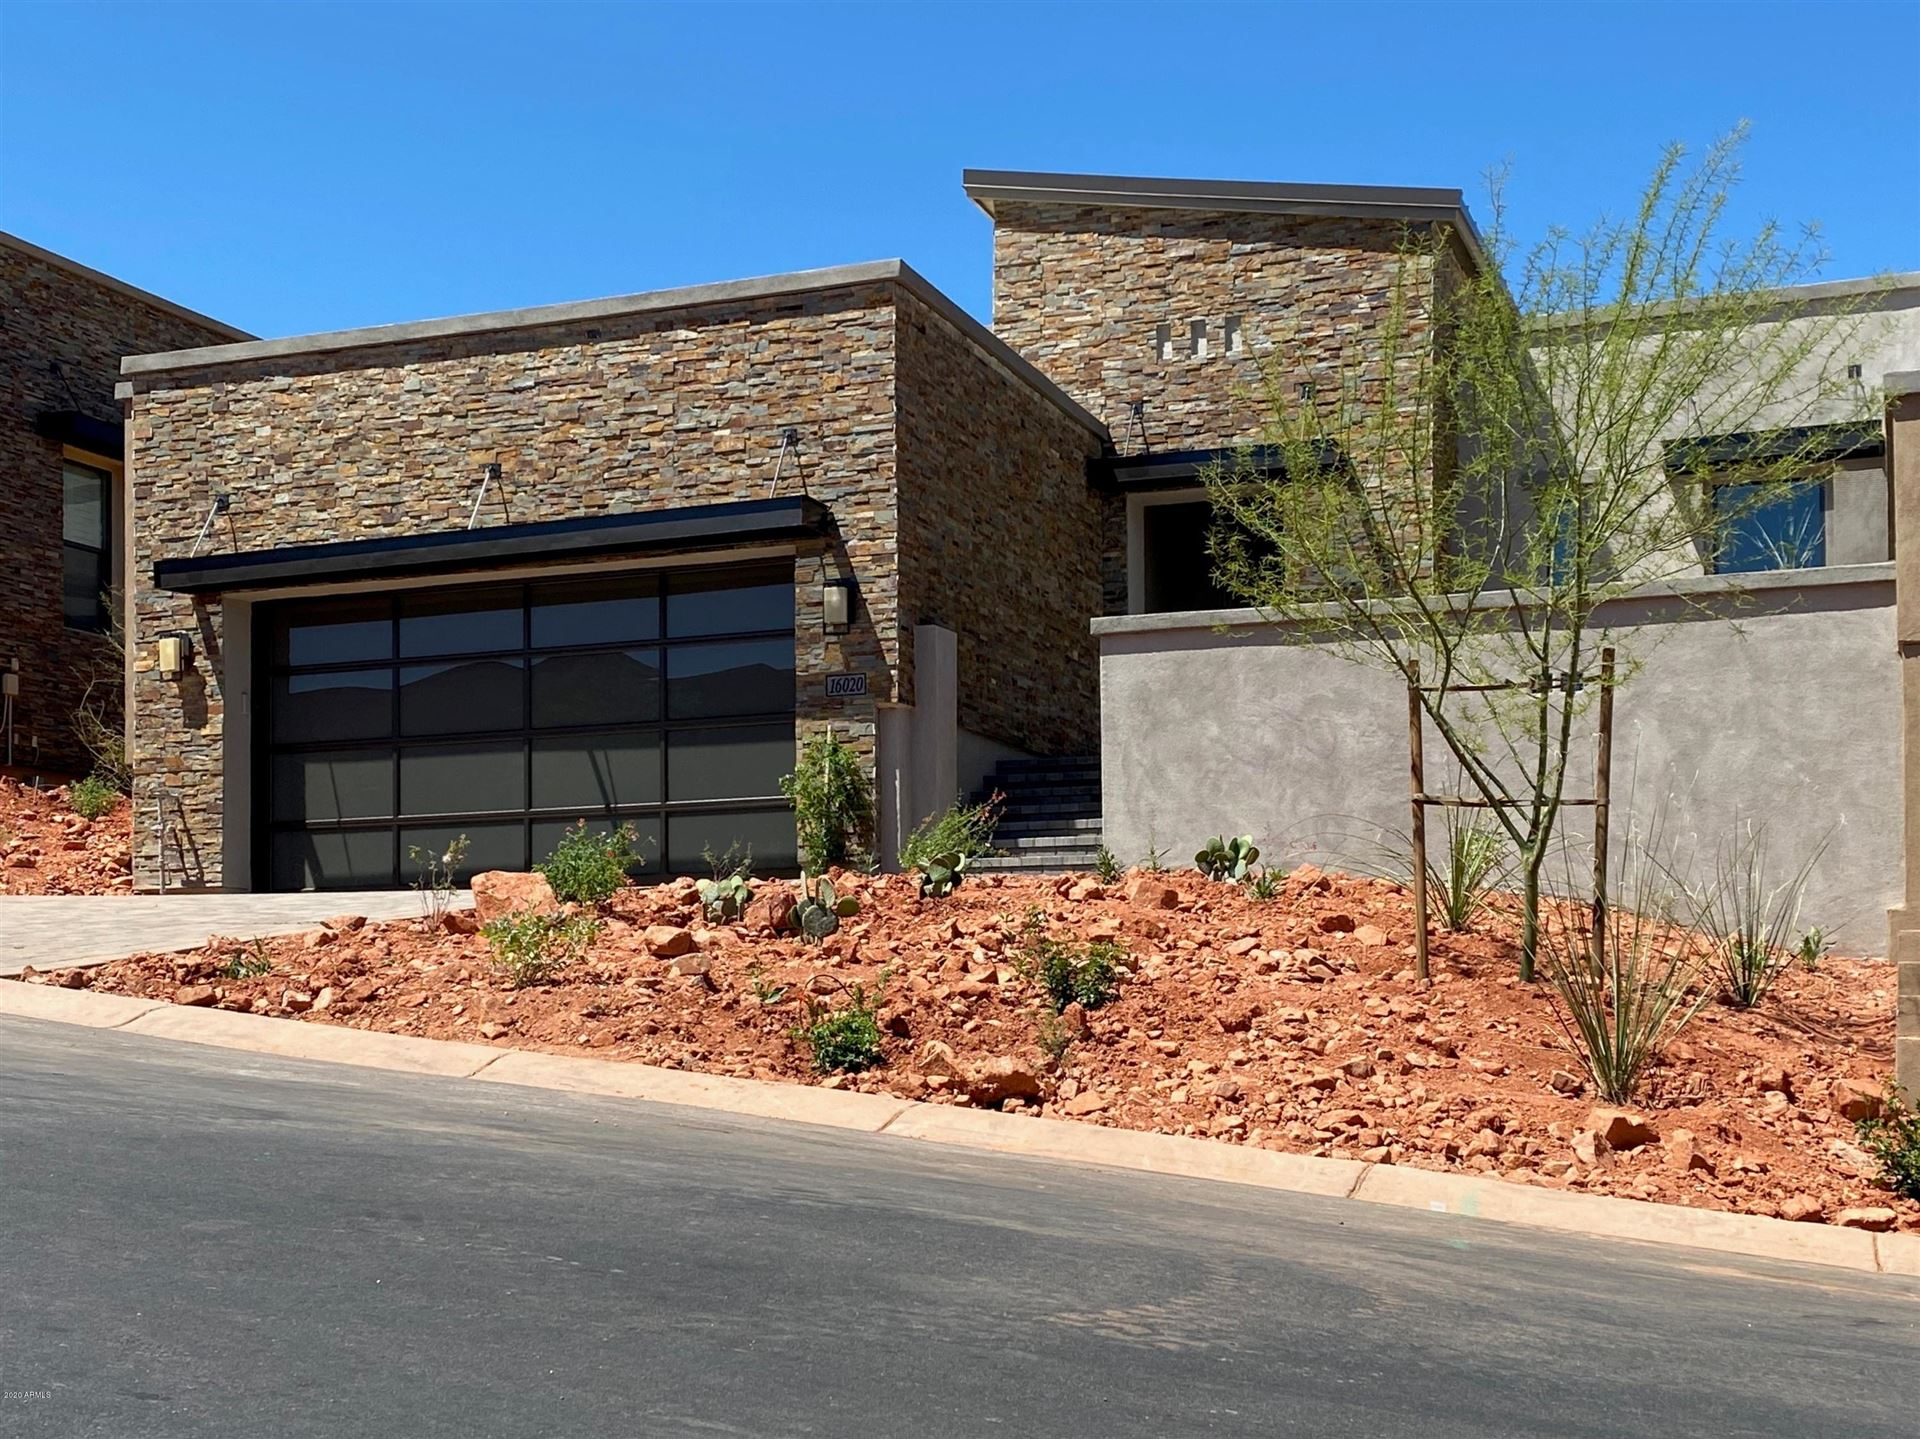 16020 E RIDGESTONE Drive, Fountain Hills, AZ 85268 - MLS#: 6041603